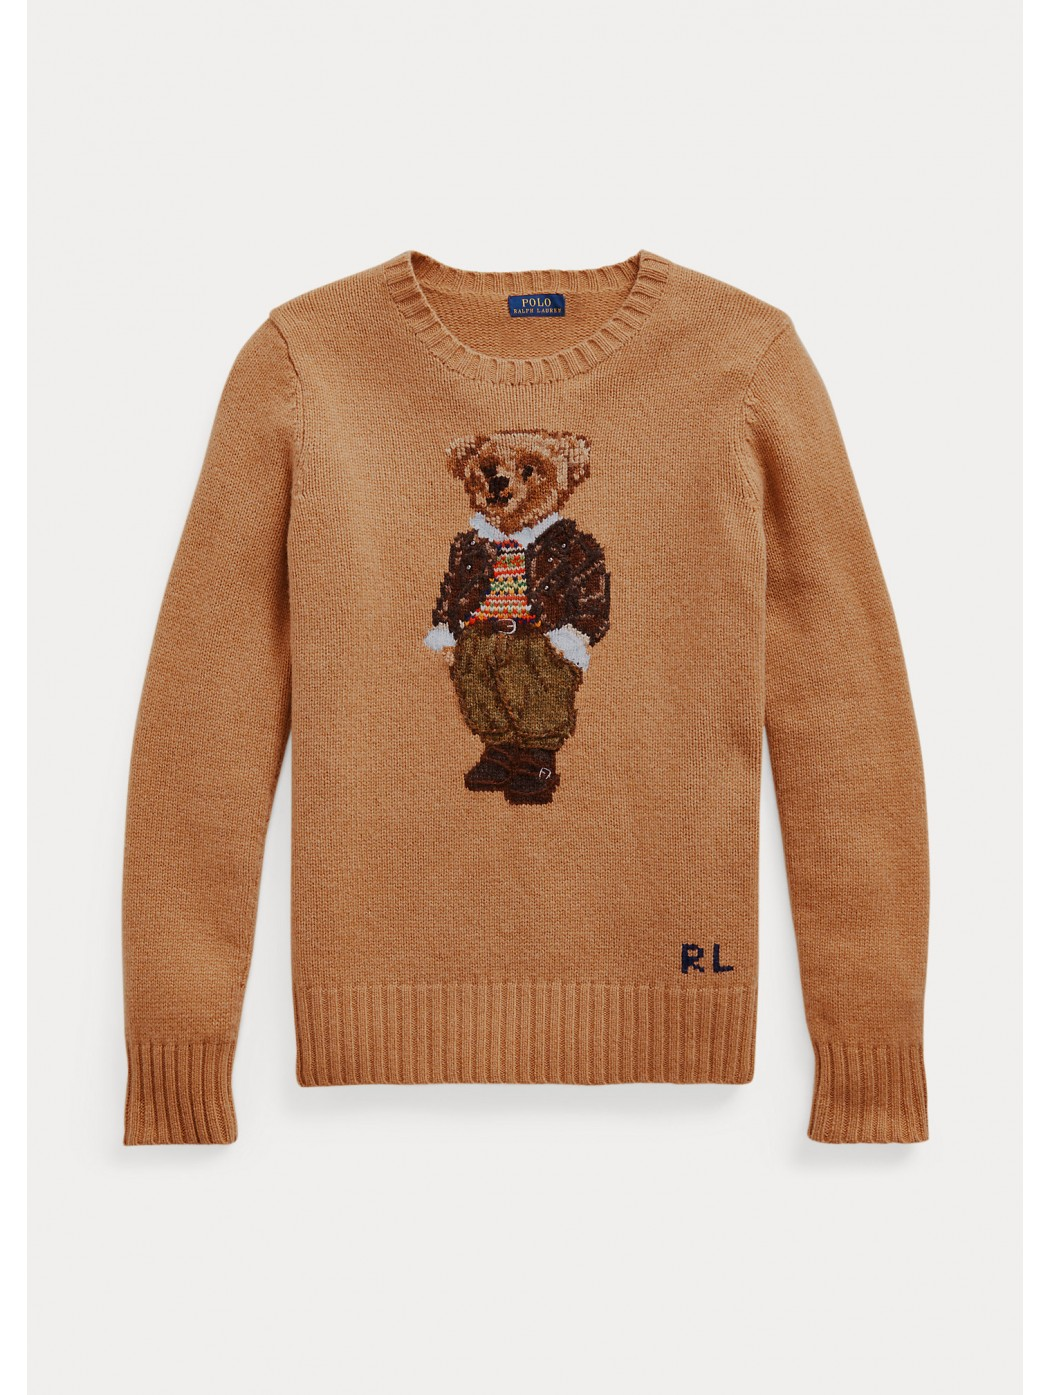 Maglia in misto lana Polo Bear POLO RALPH LAUREN DONNA 211815102 001